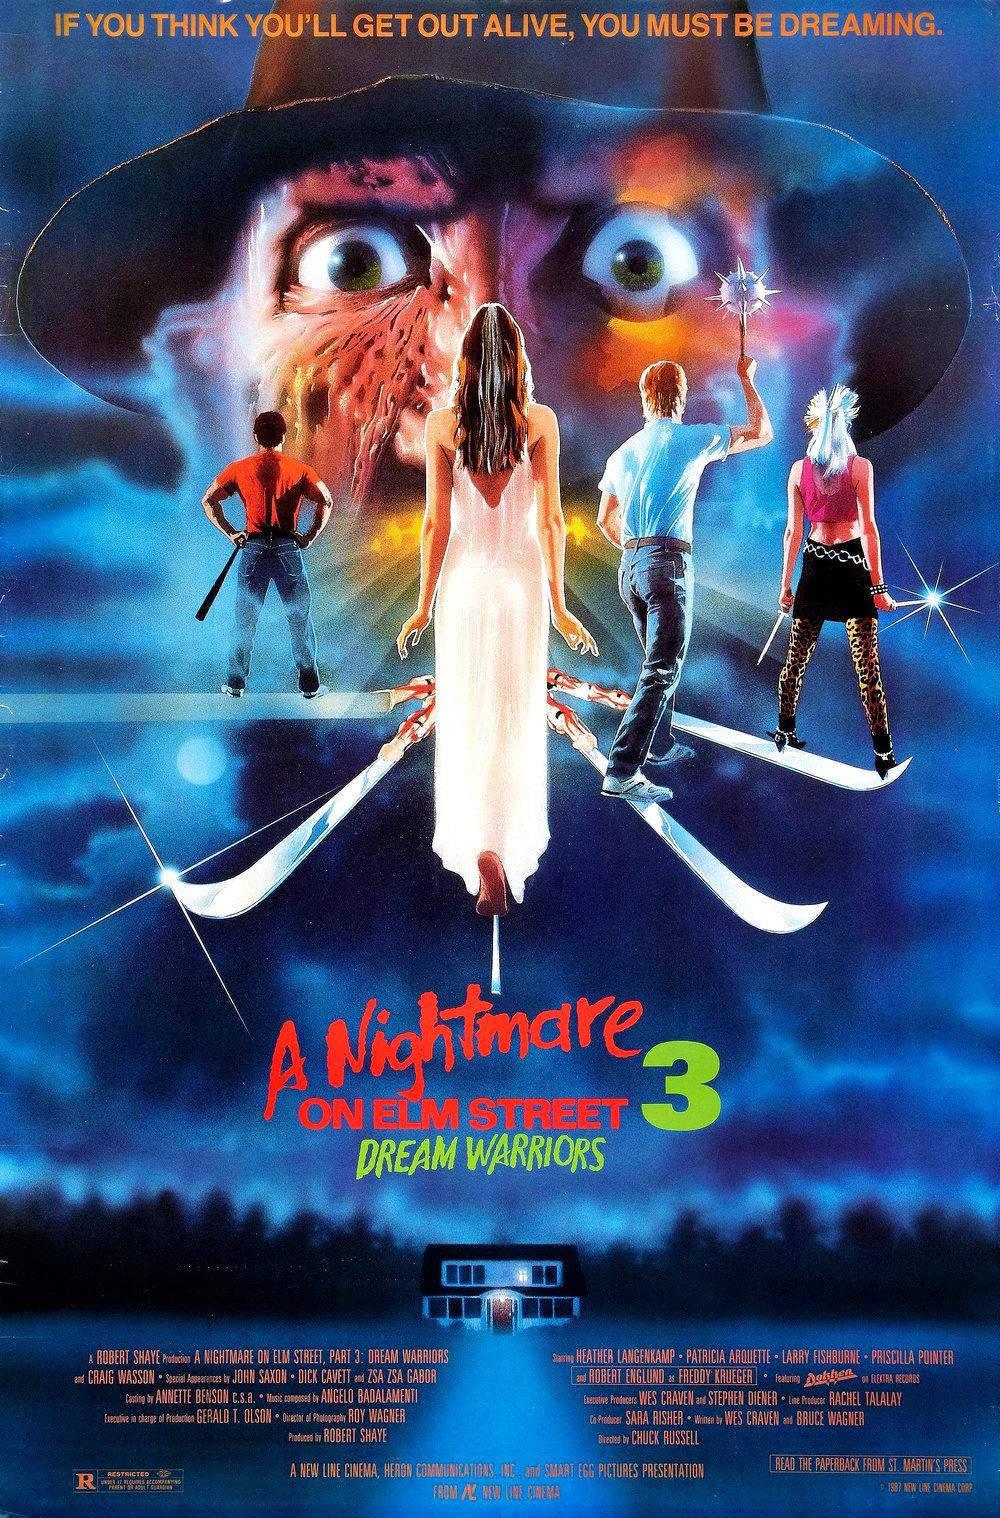 nightmare-on-elm-street-3-movie-poster-1988-1.jpg